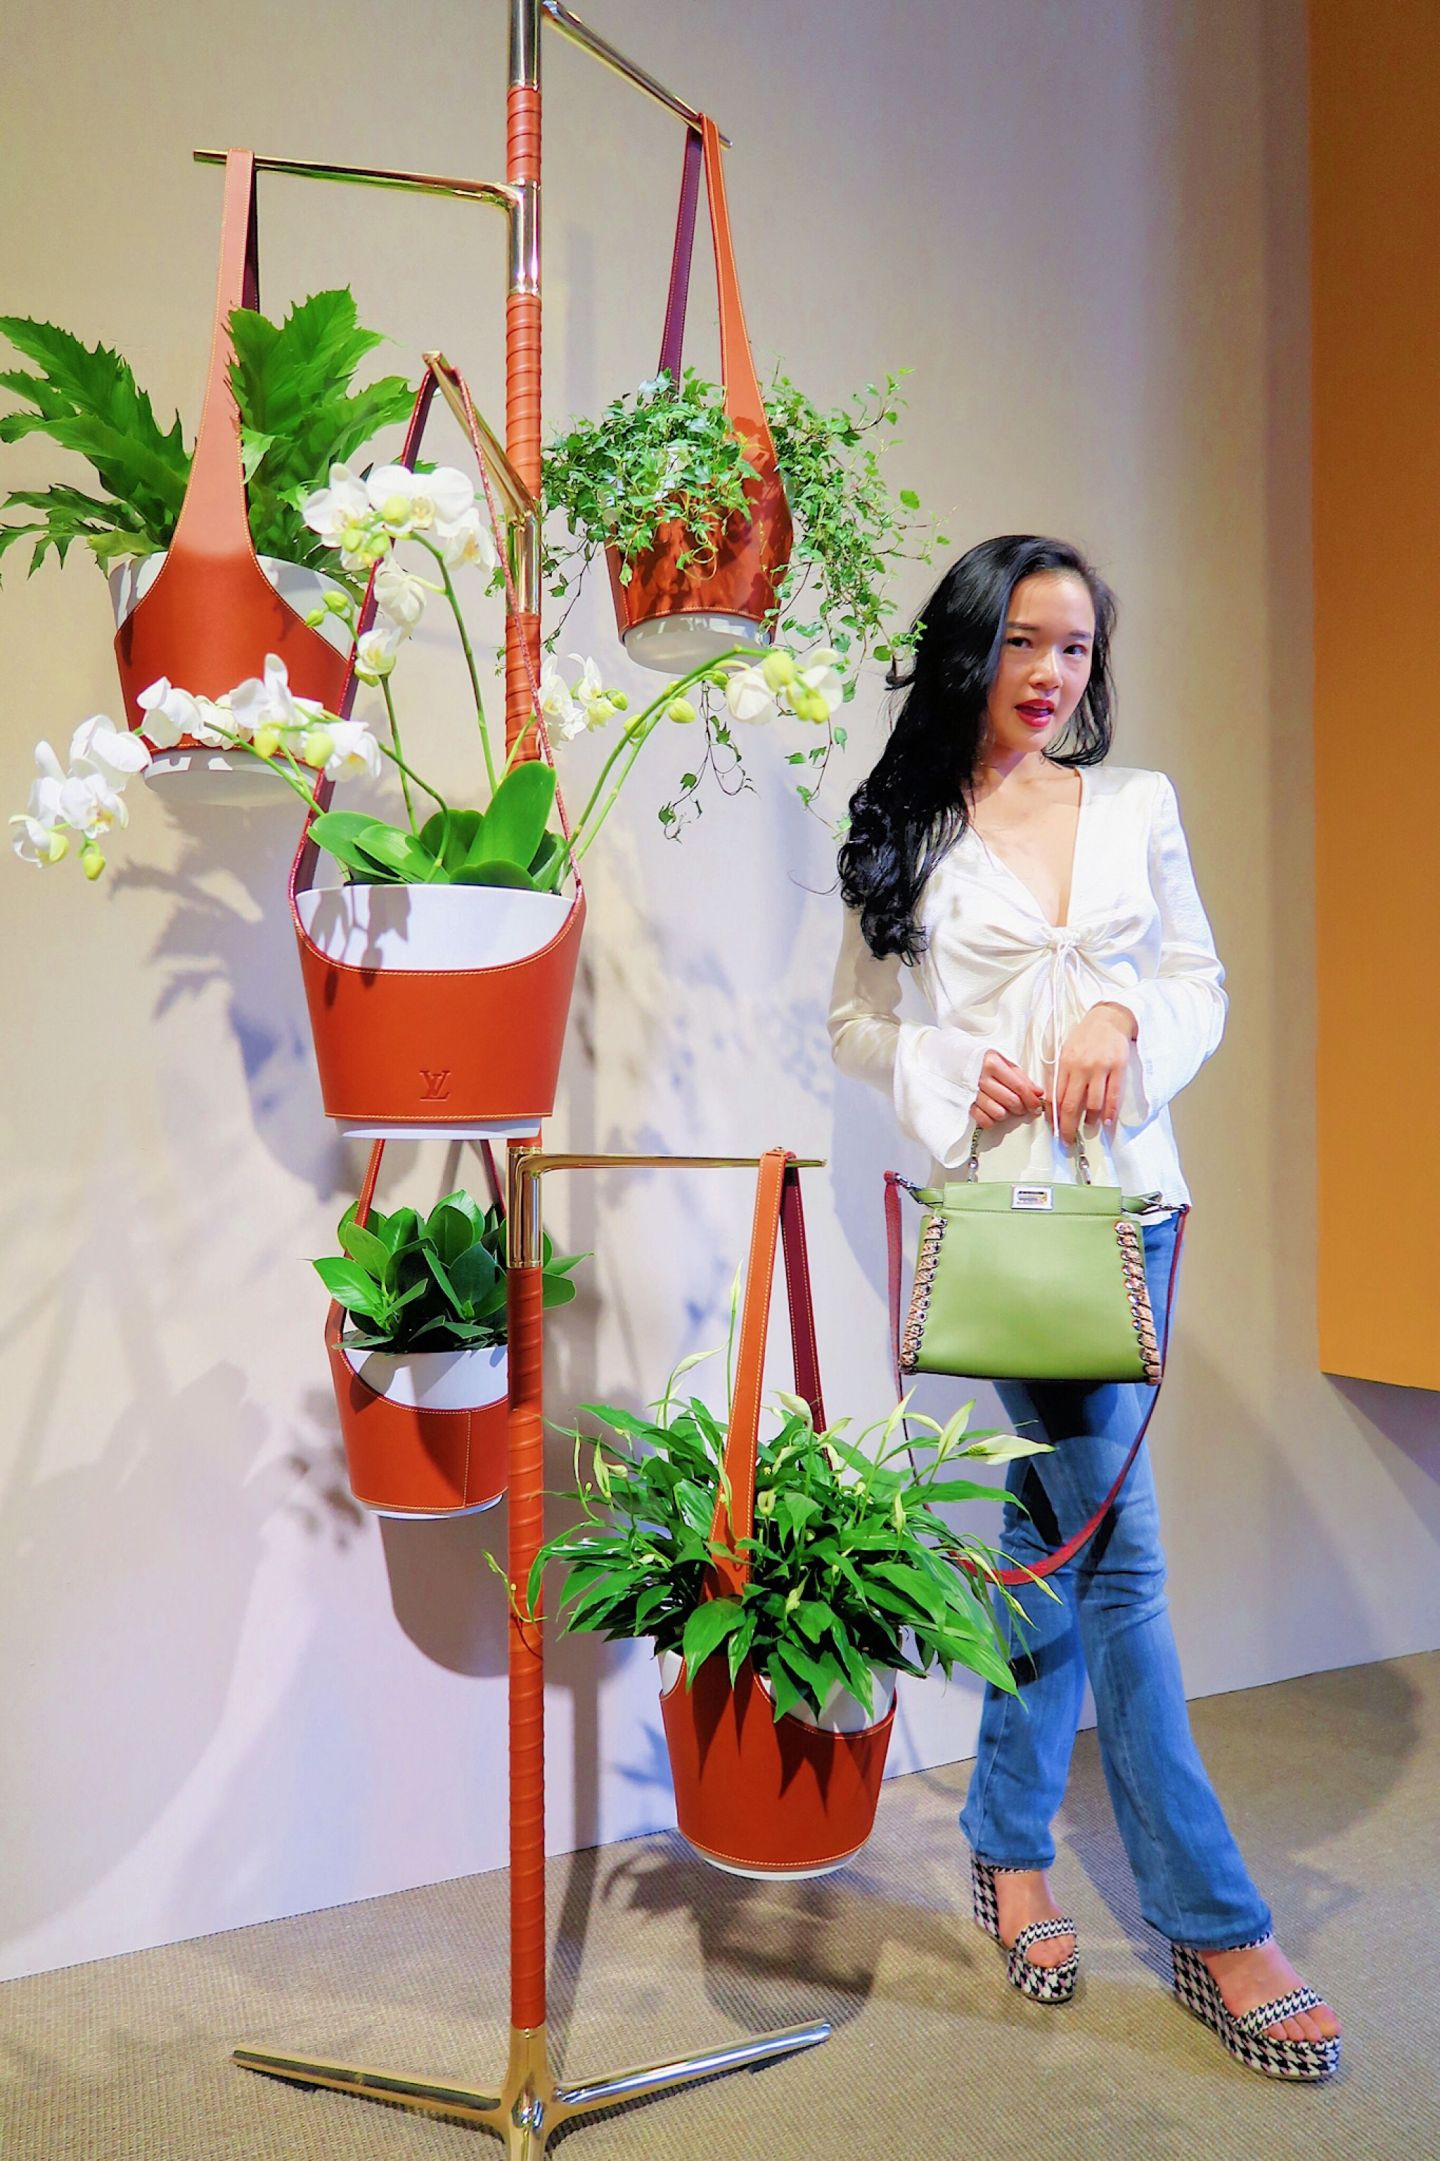 Louis Vuitton X Objet Nomade | Travel Collection 2018 | Milan Art Exhibit